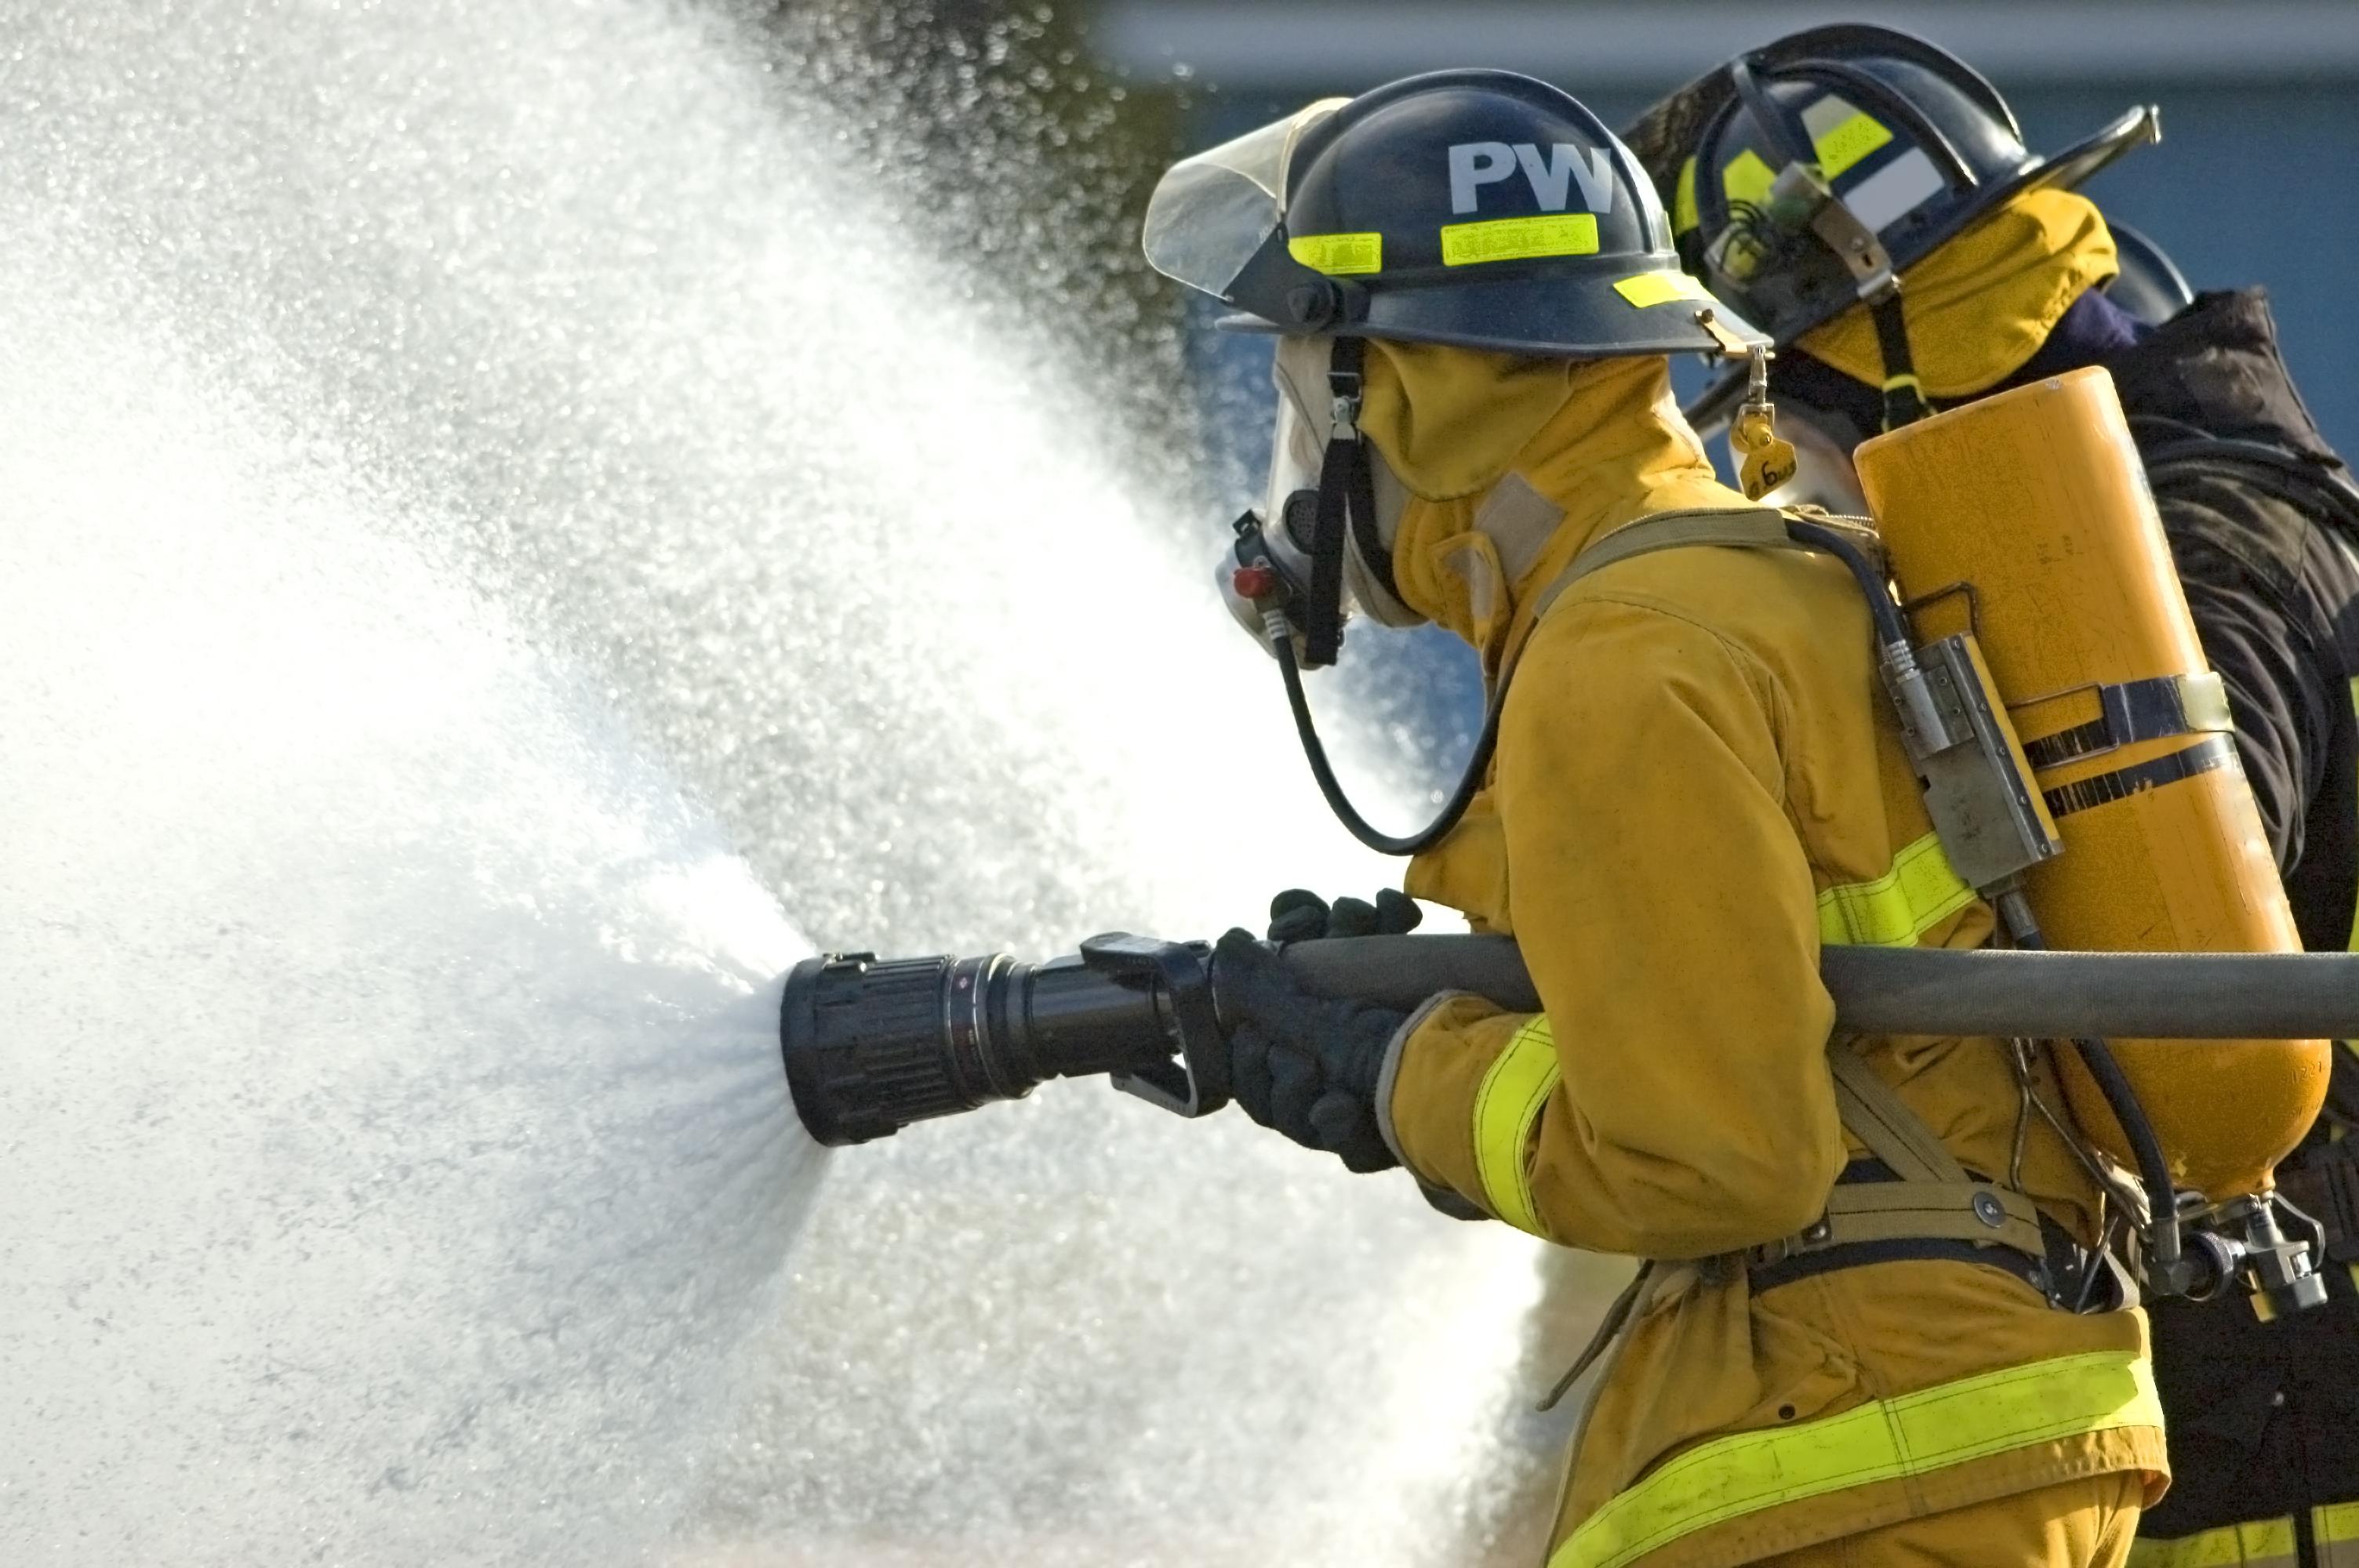 Fire Hose Communications? A Smarter Approach to Internal